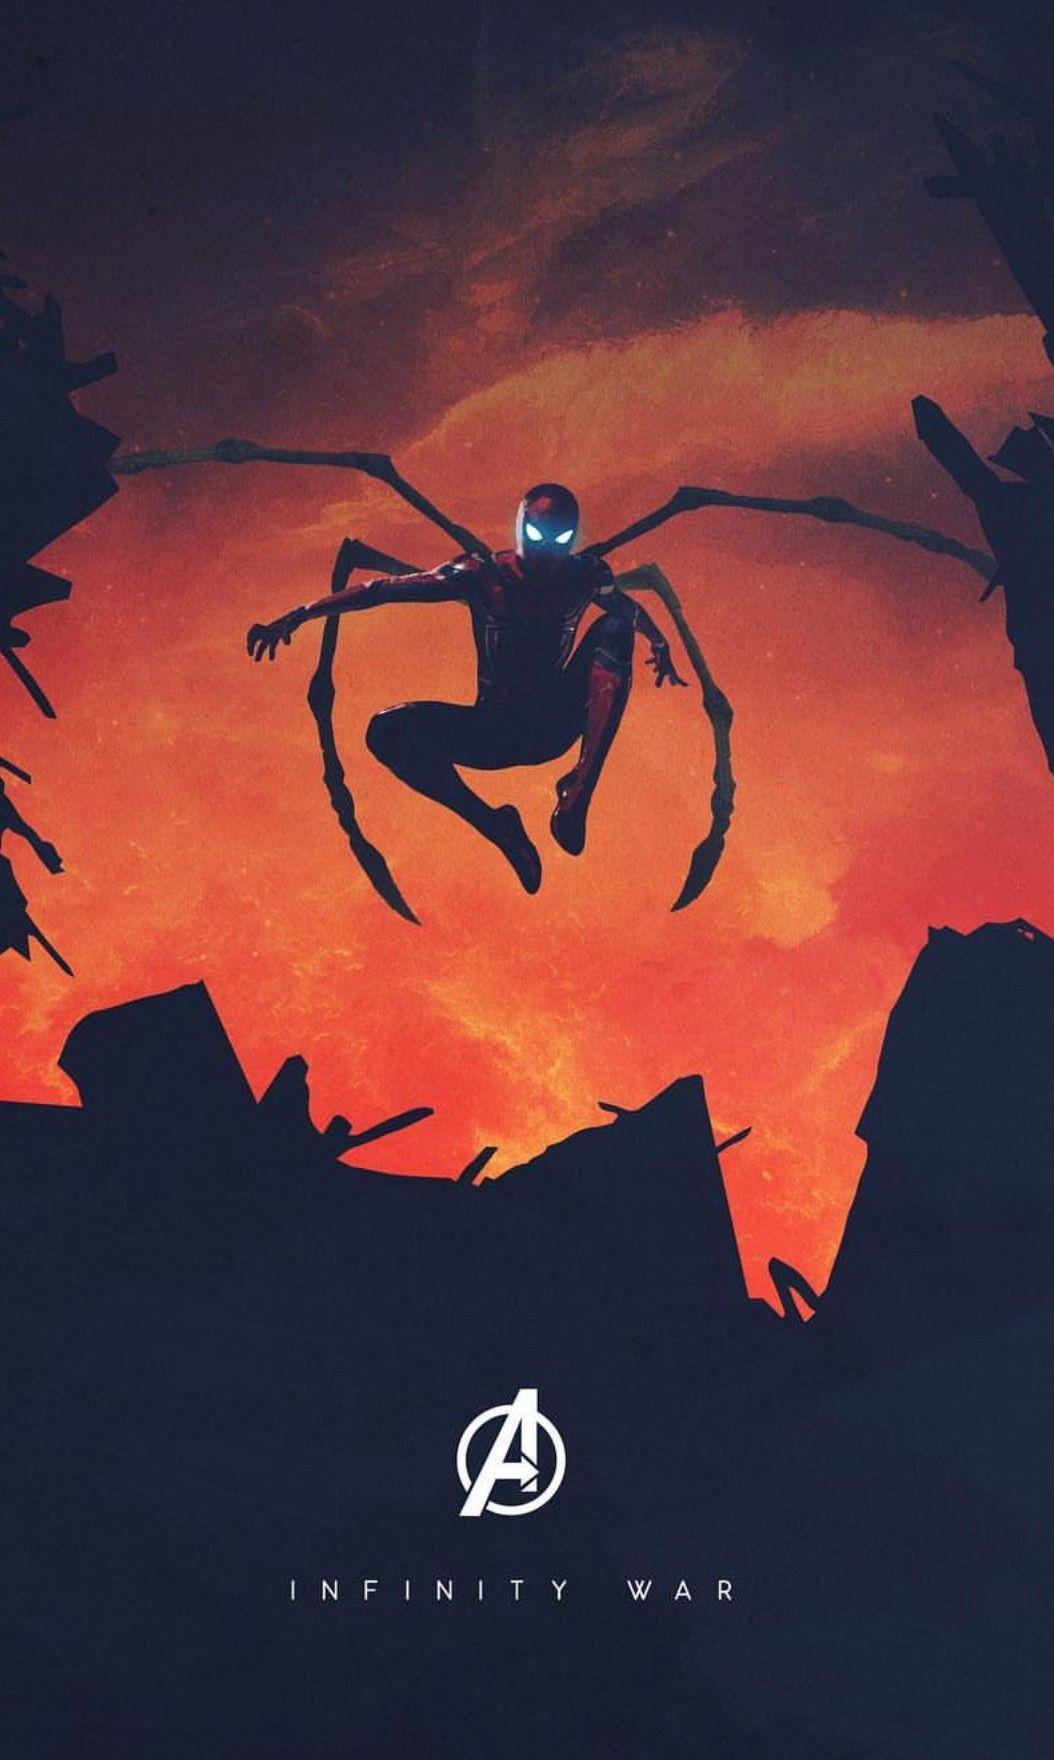 Iron Spider Man Avengers Infinity War Marvel Wallpaper Marvel Superheroes Avengers Wallpaper